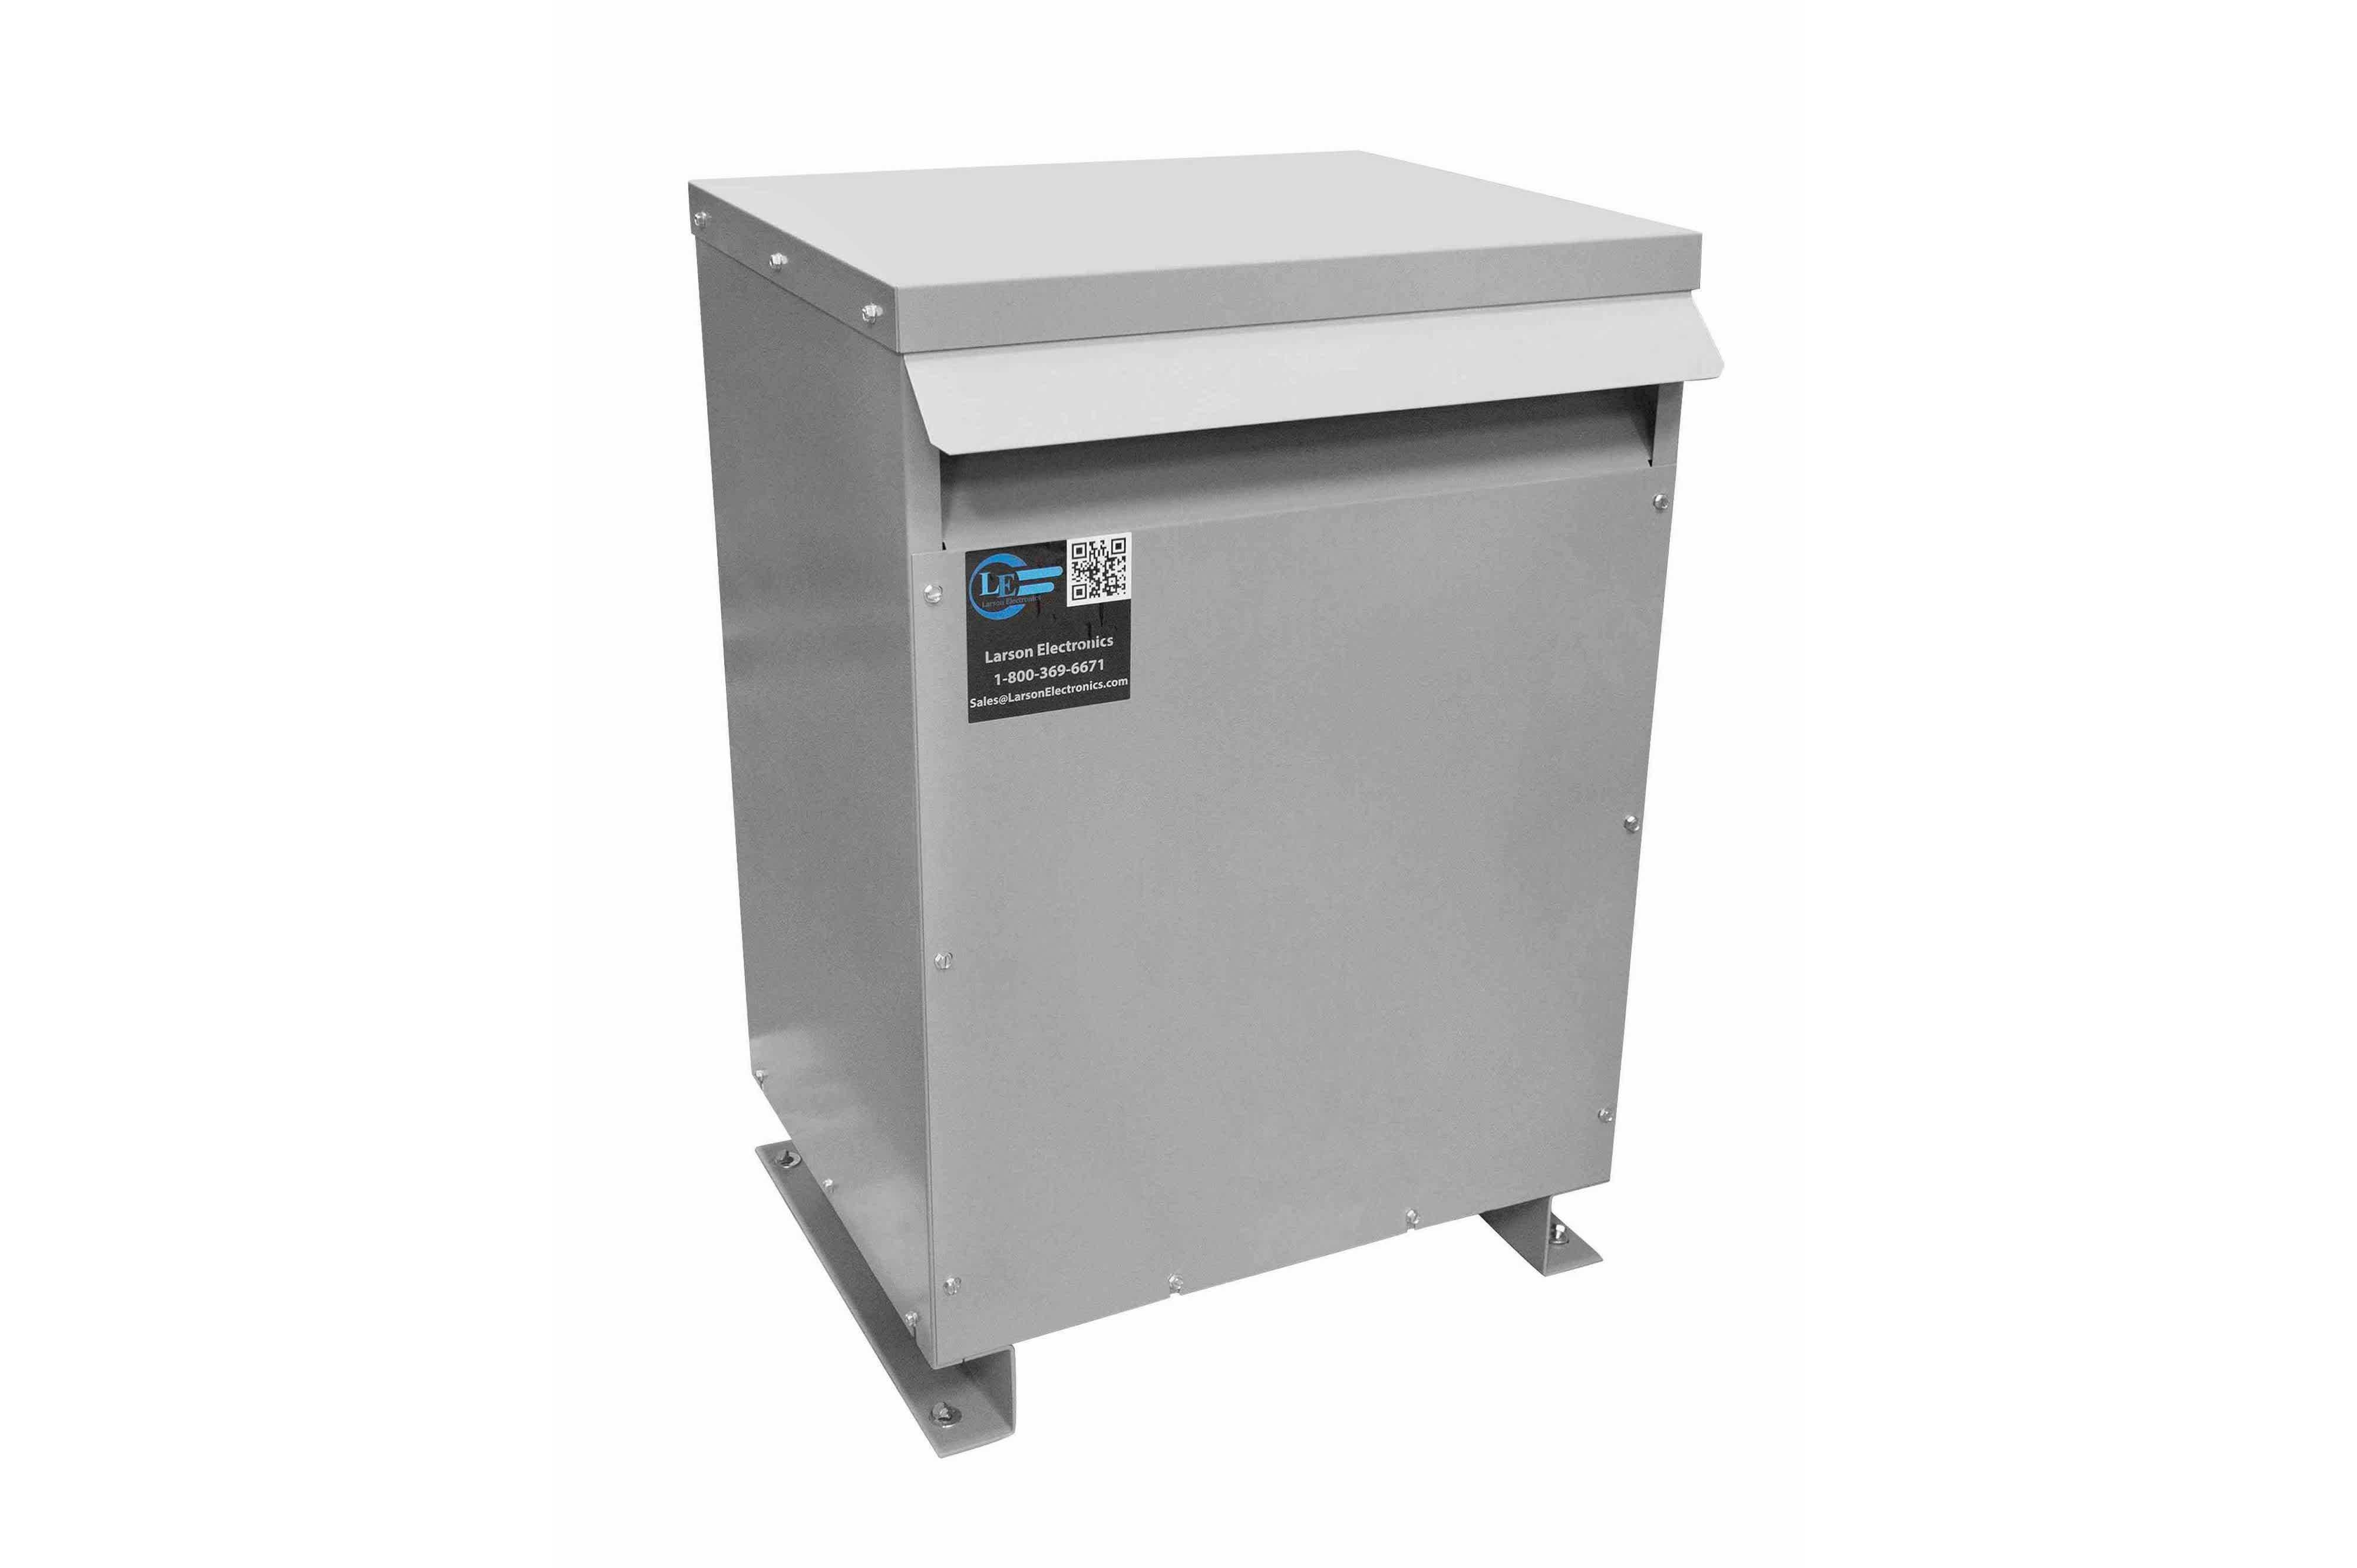 750 kVA 3PH Isolation Transformer, 460V Wye Primary, 575Y/332 Wye-N Secondary, N3R, Ventilated, 60 Hz